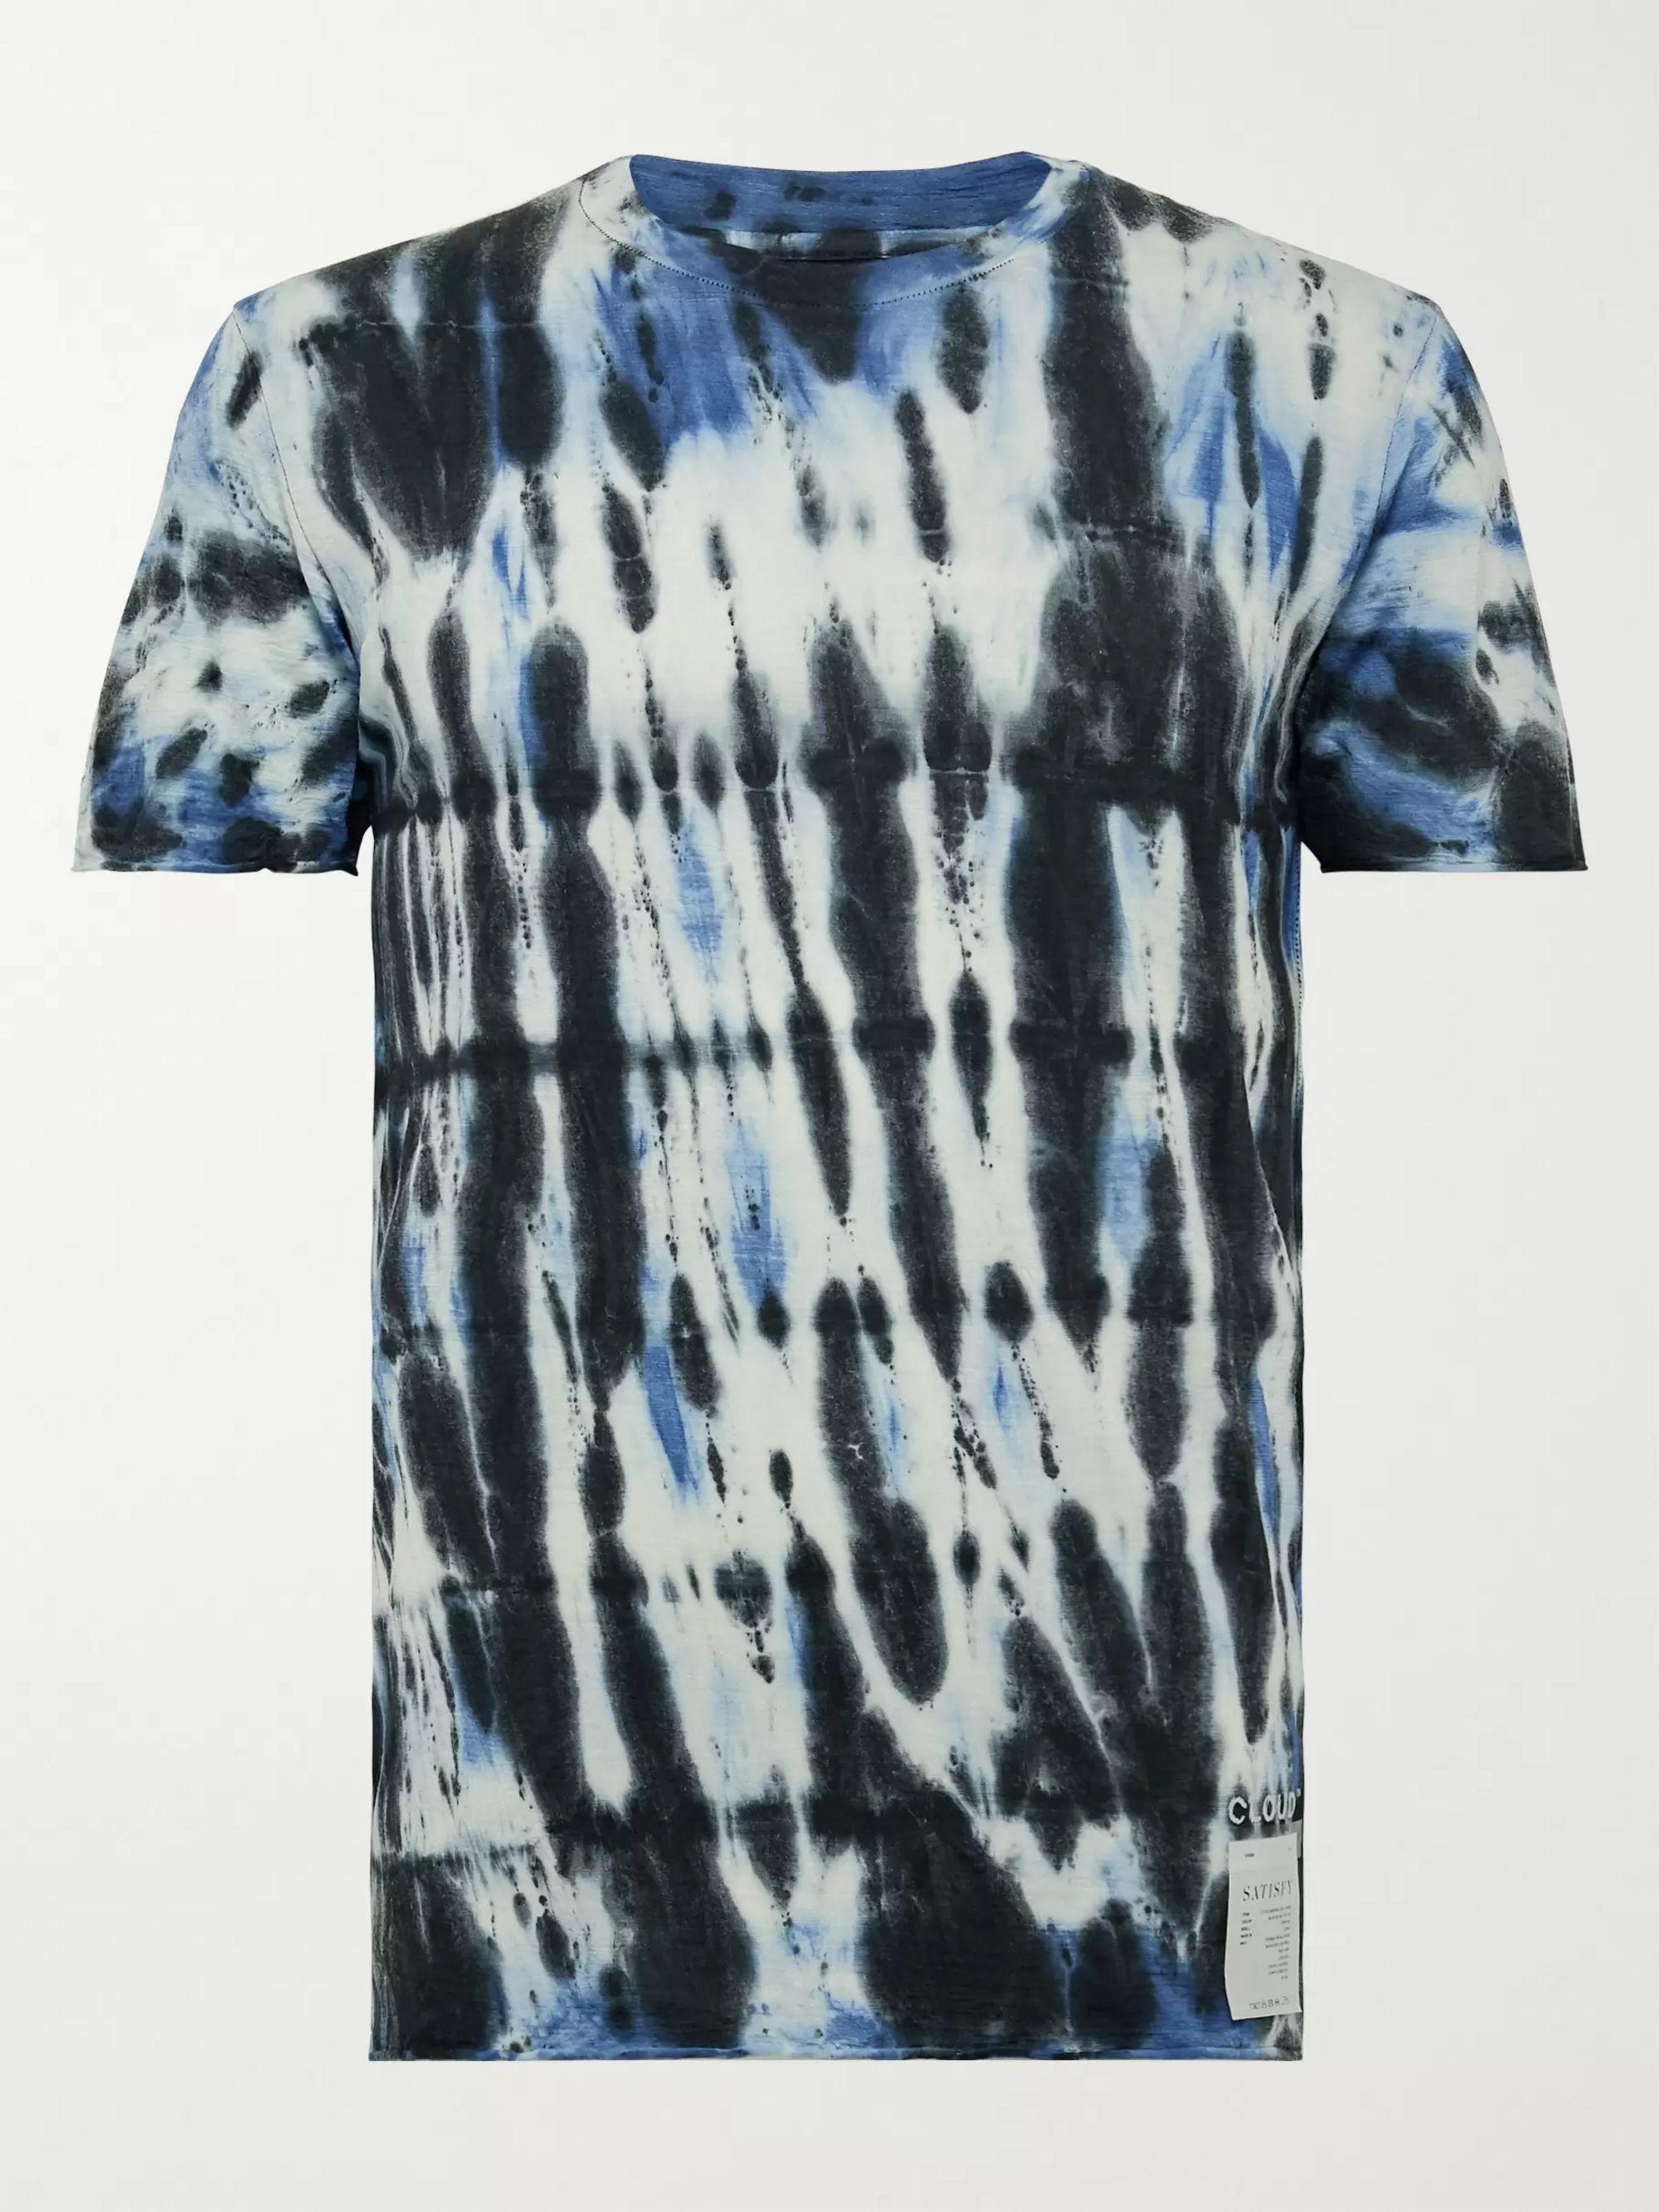 Black Tie-Dyed Cloud Merino T-Shirt | Satisfy | MR PORTER